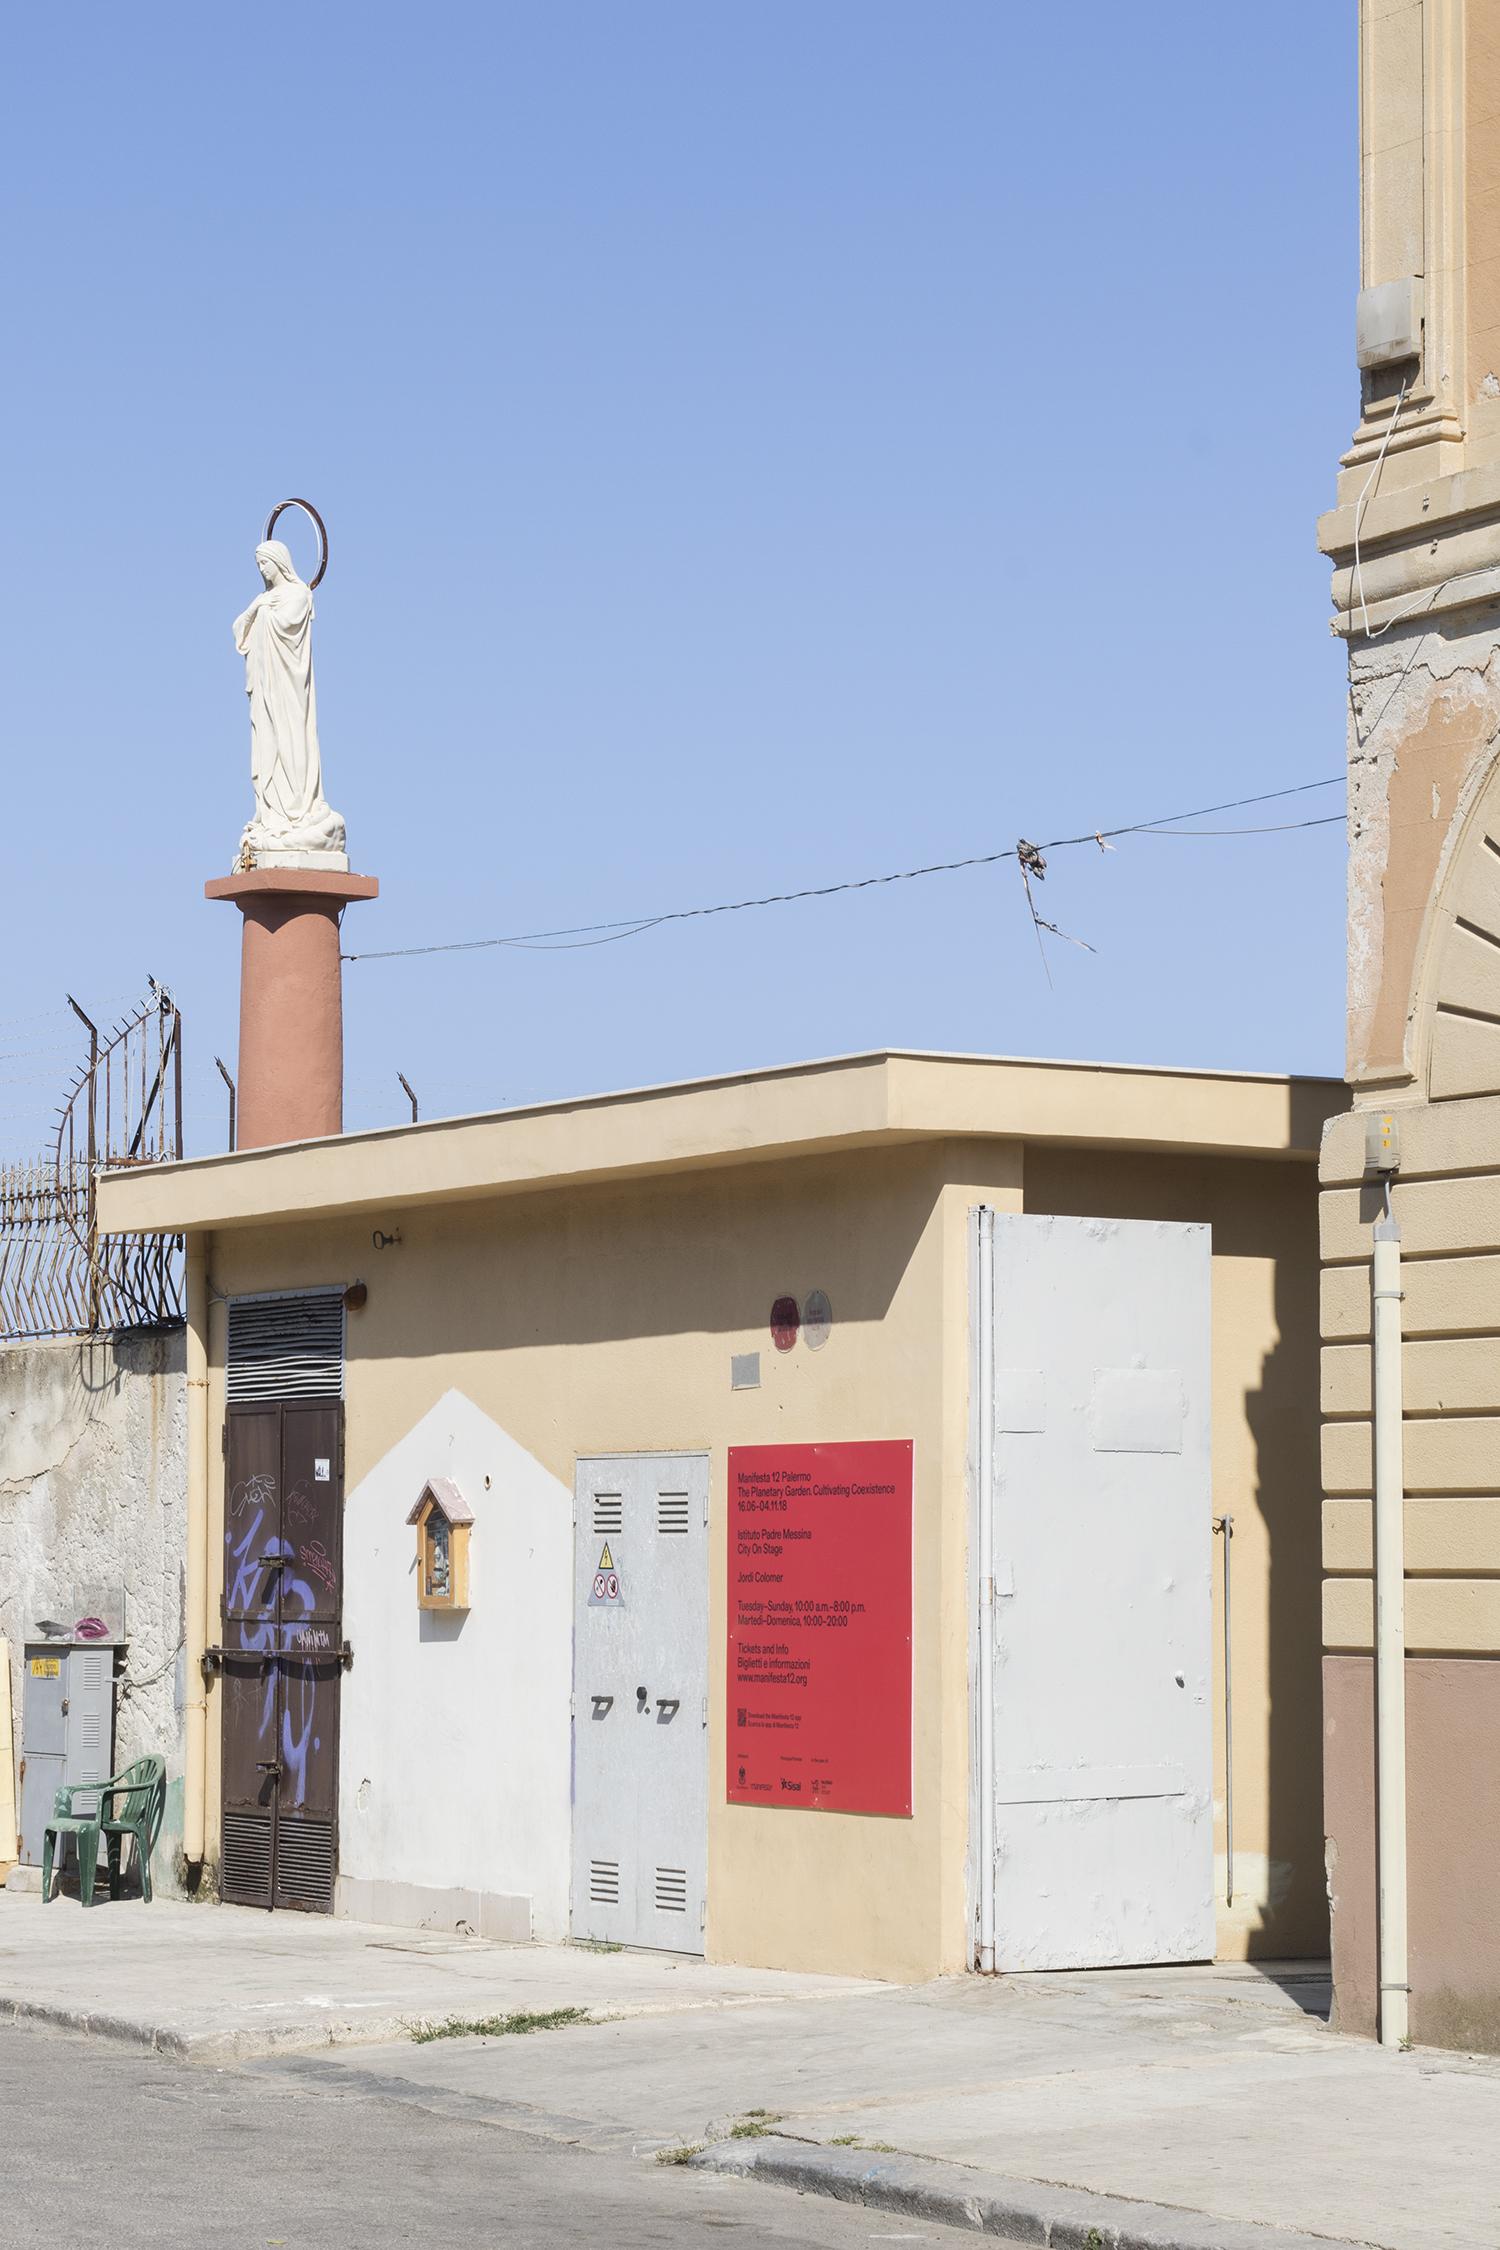 Indgang ved Fondazione di Padre Messina. Foto © I DO ART Agency.